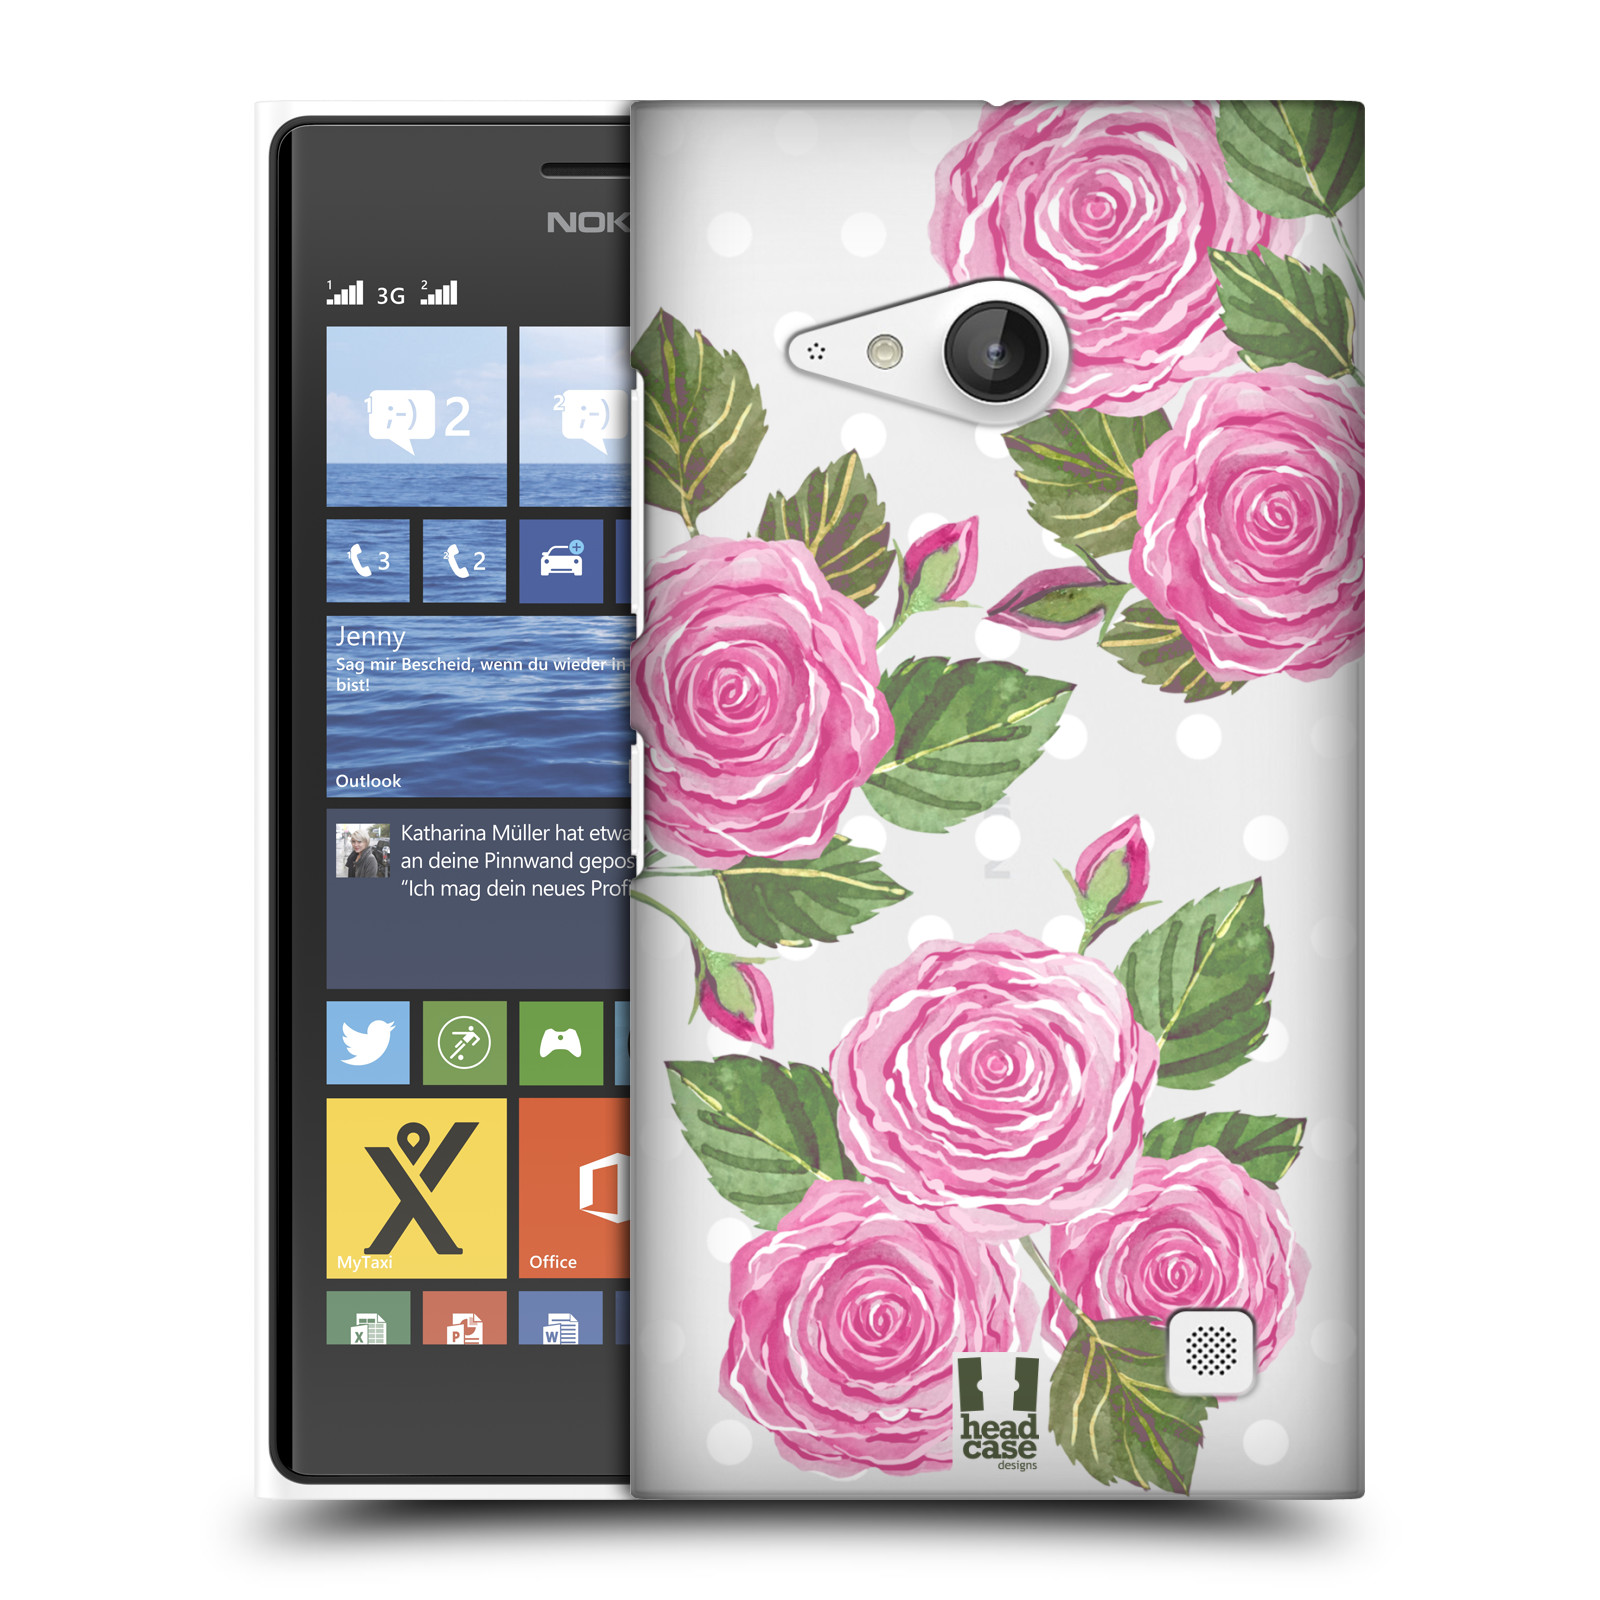 Plastové pouzdro na mobil Nokia Lumia 730 Dual SIM - Head Case - Hezoučké růžičky - průhledné (Plastový kryt či obal na mobilní telefon s motivem Hezkých růžiček pro Nokia Lumia 730 Dual SIM)